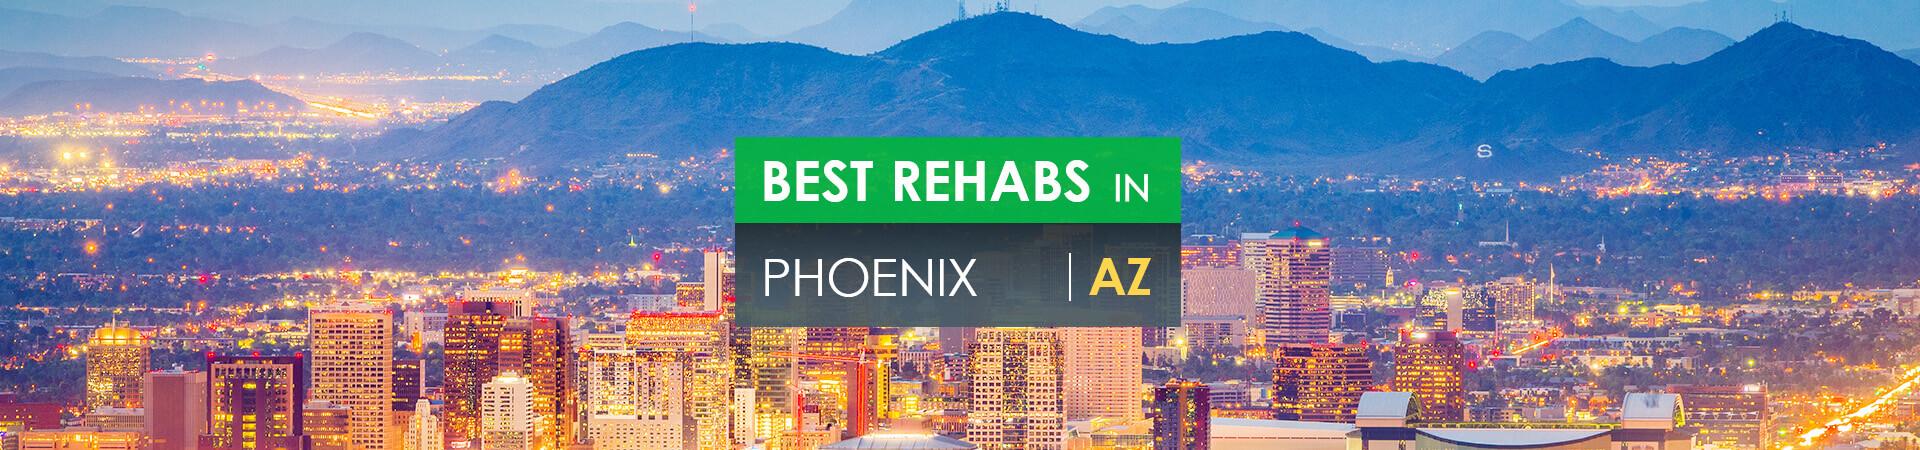 Best rehabs in Phoenix, AZ